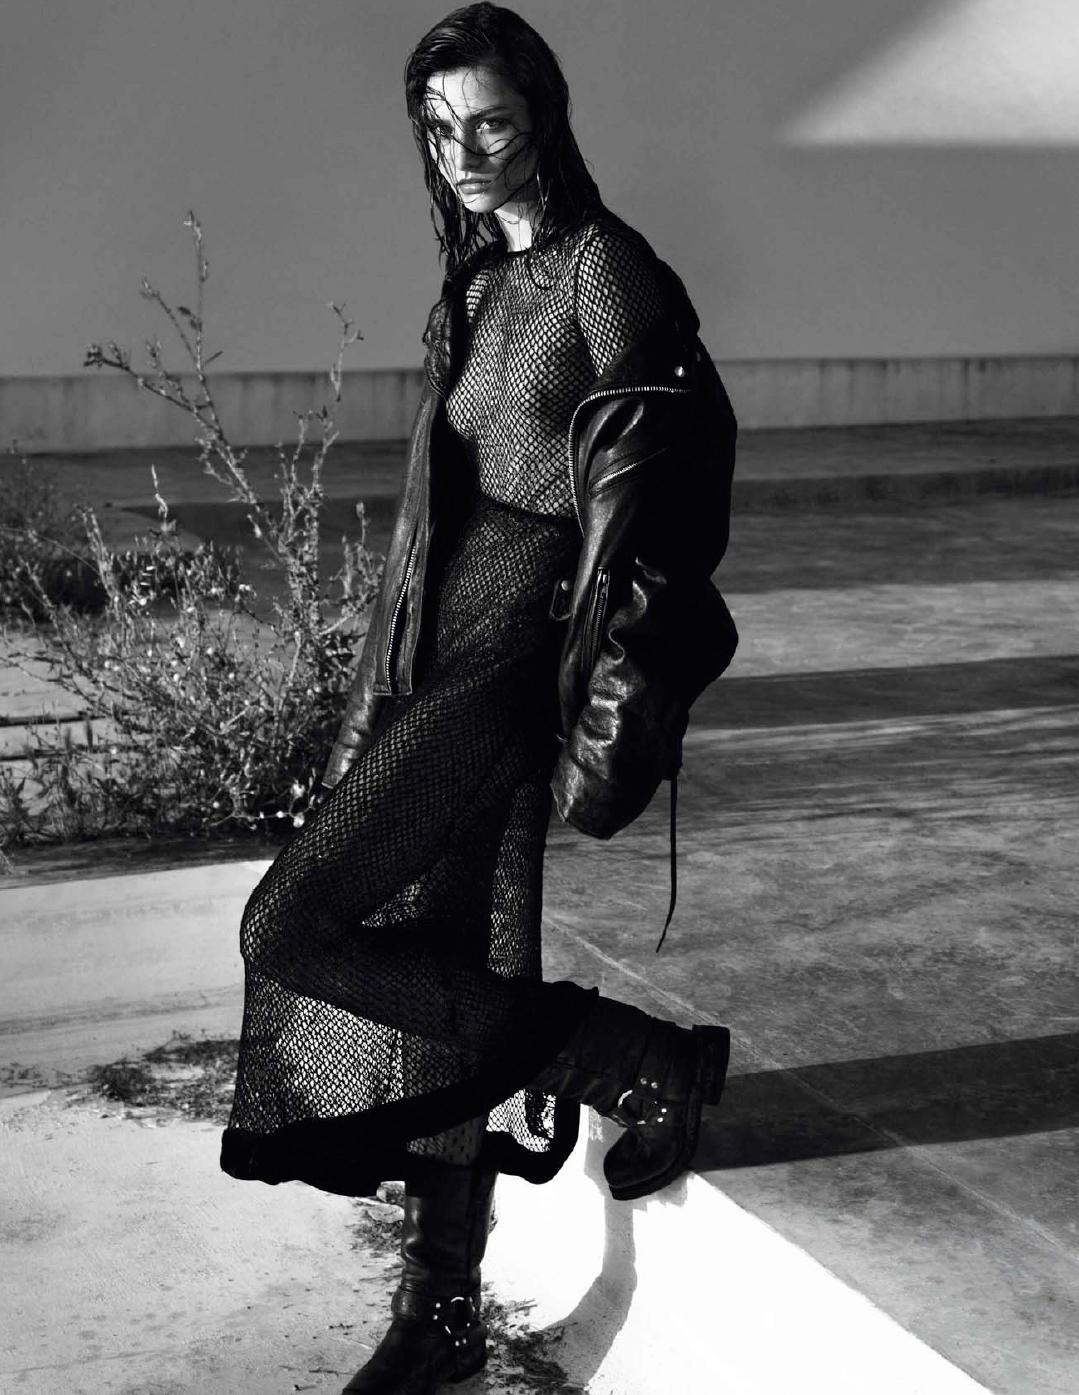 Andree_Diaconu-Mert_Alas-Marcus_Piggott-Vogue_Paris-01.jpg